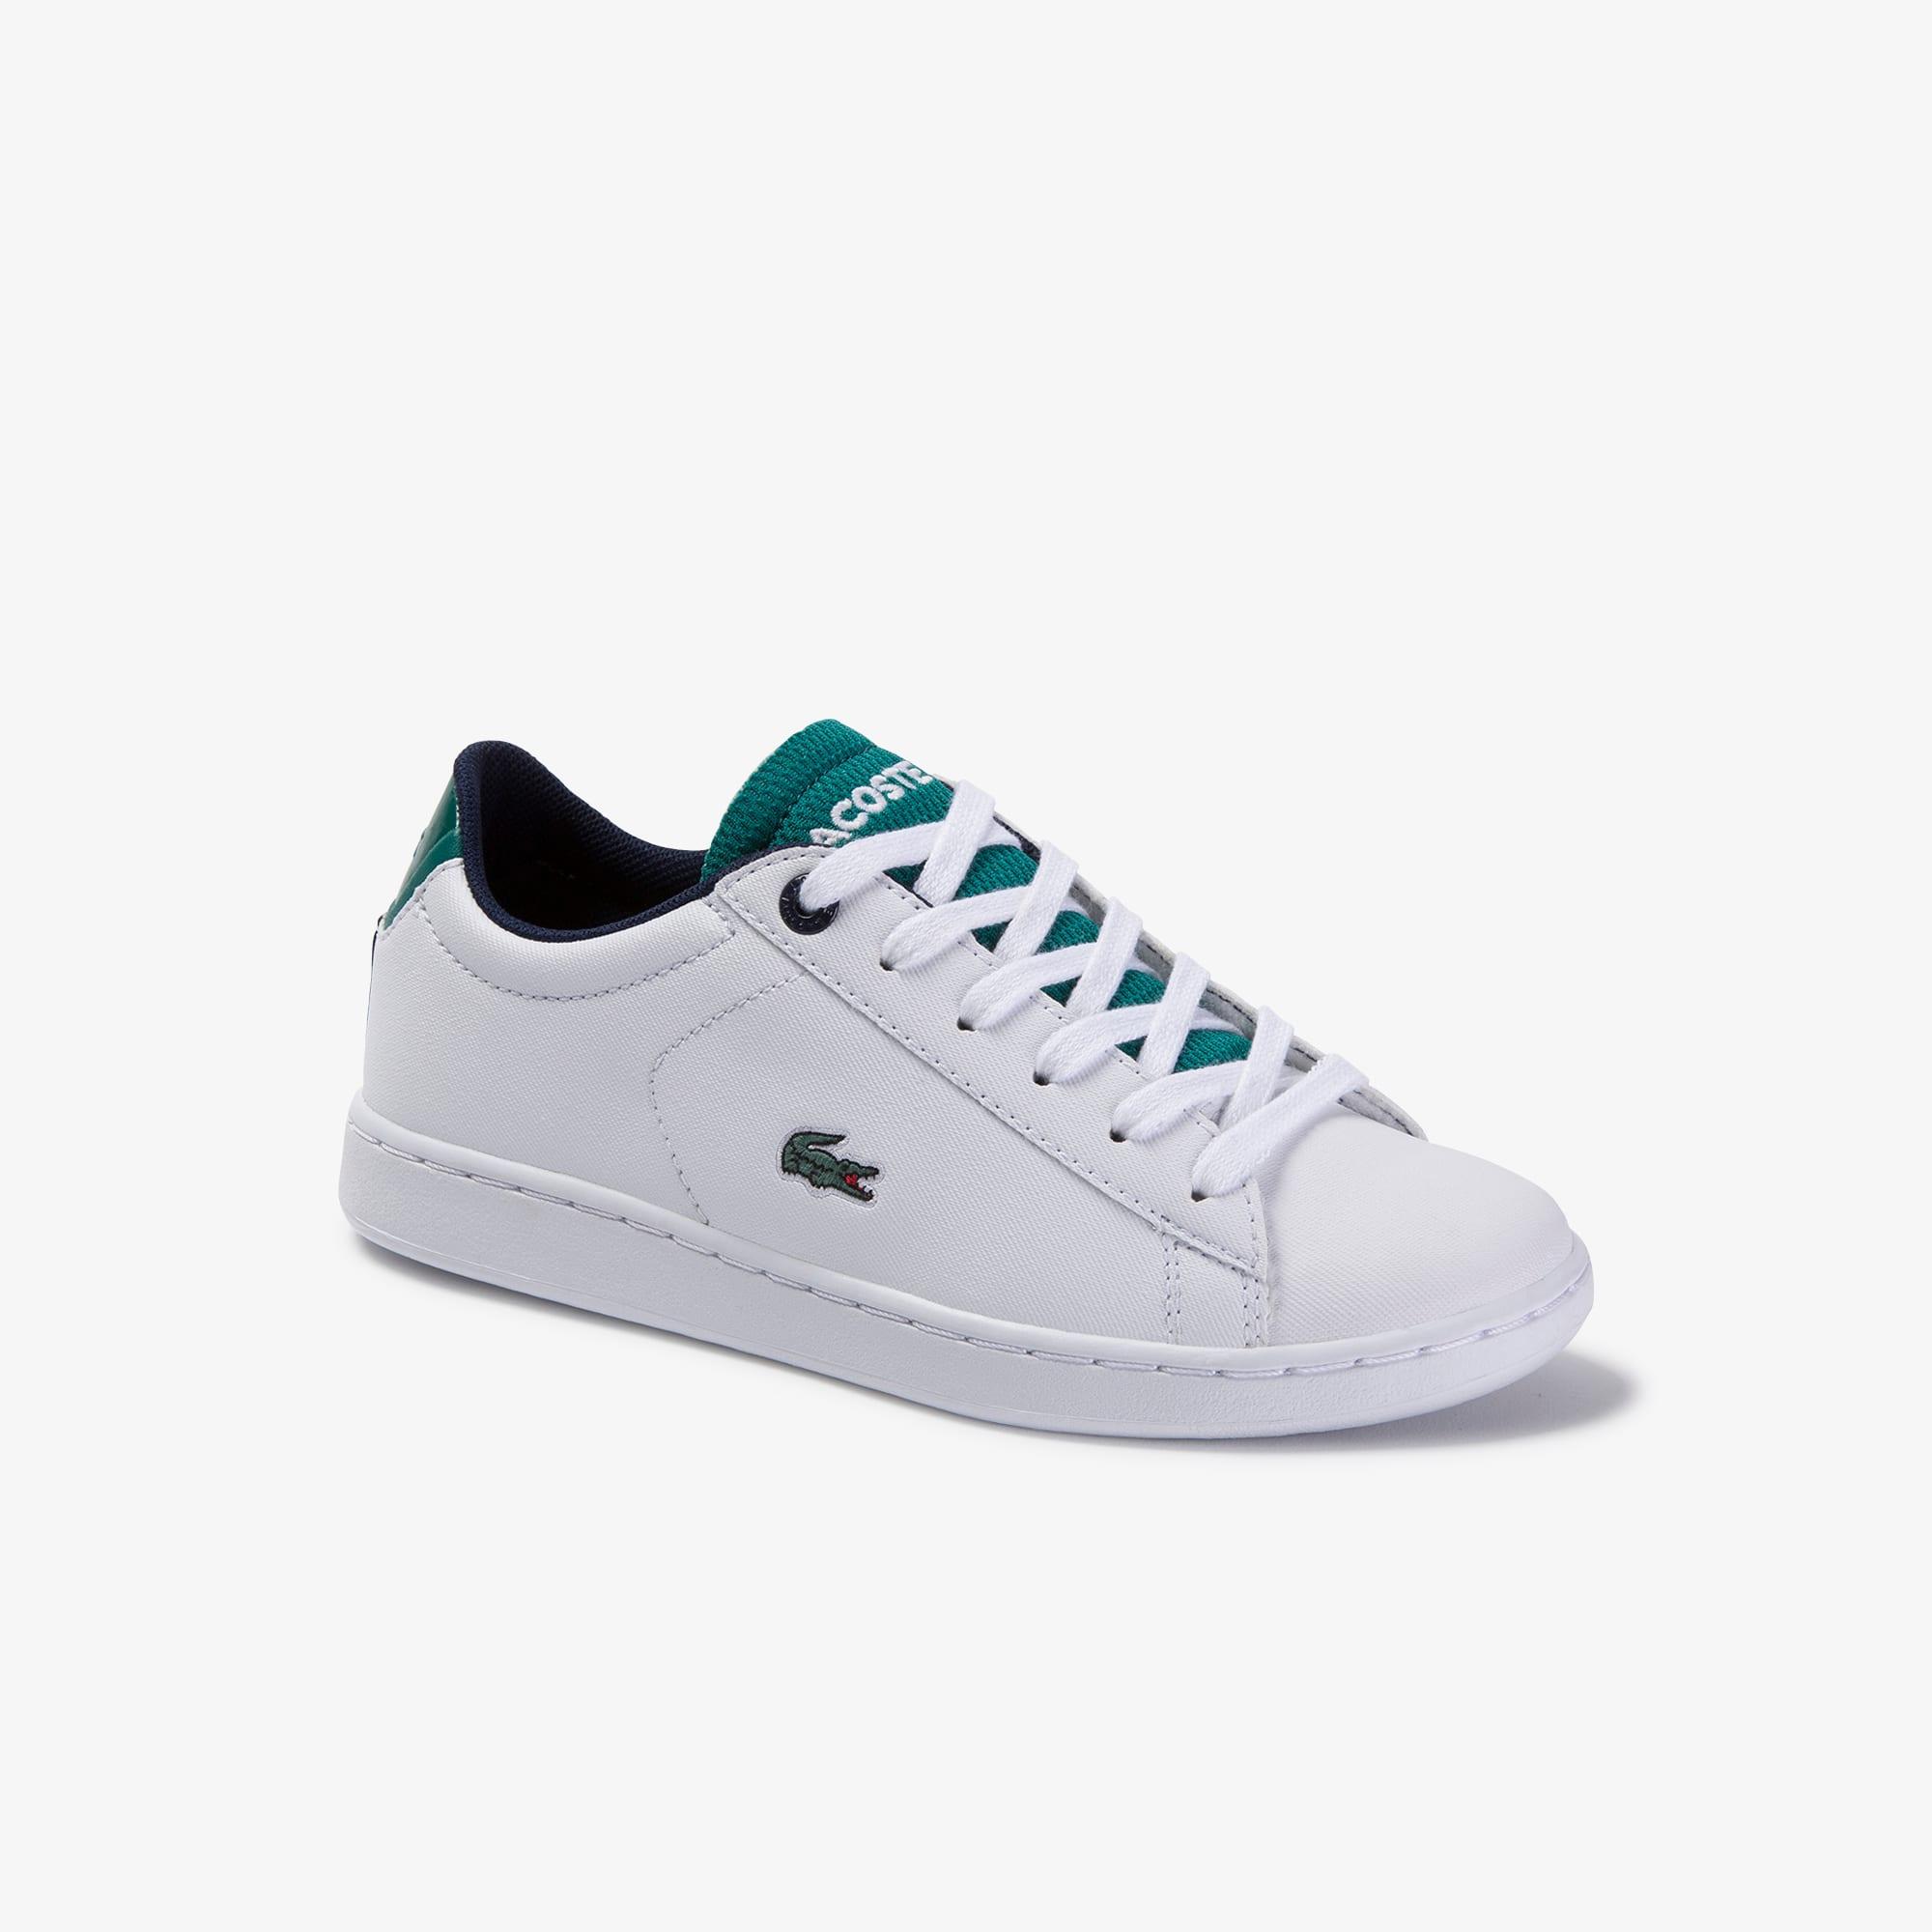 Teen-Sneakers CARANABY EVO aus Synthetik und Textil